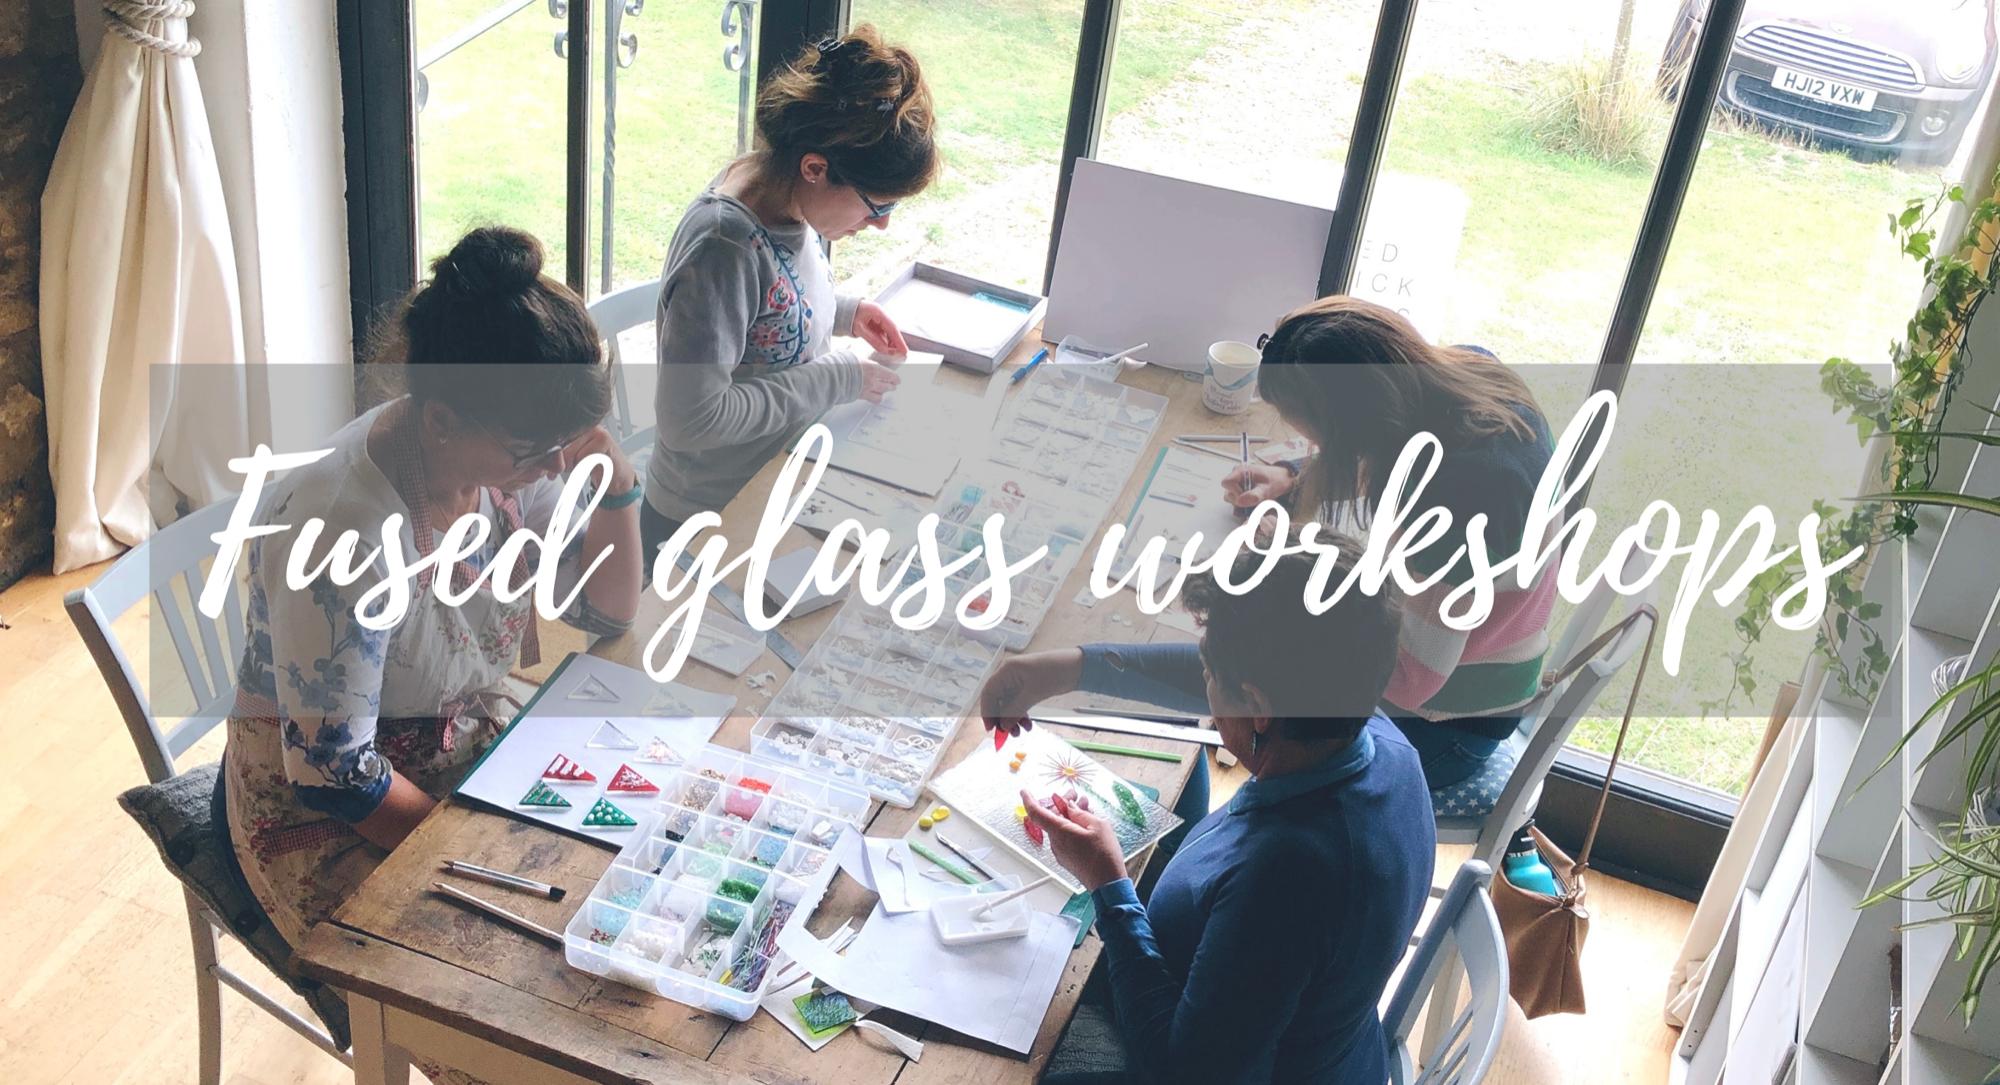 Fused glass workshops 2-2